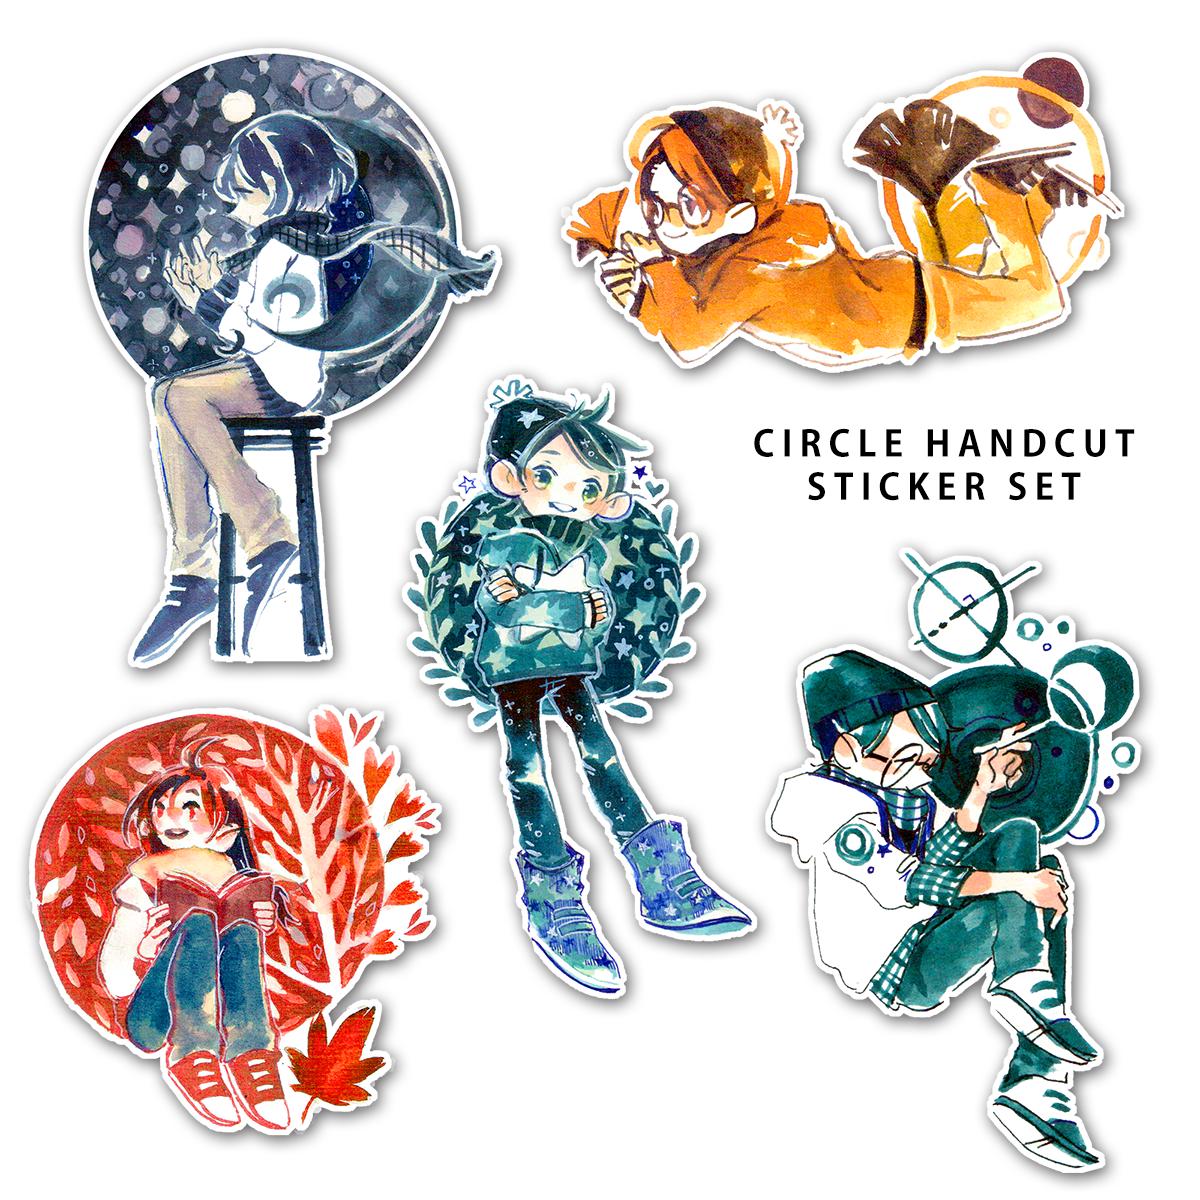 Circle Handcut Sticker Set